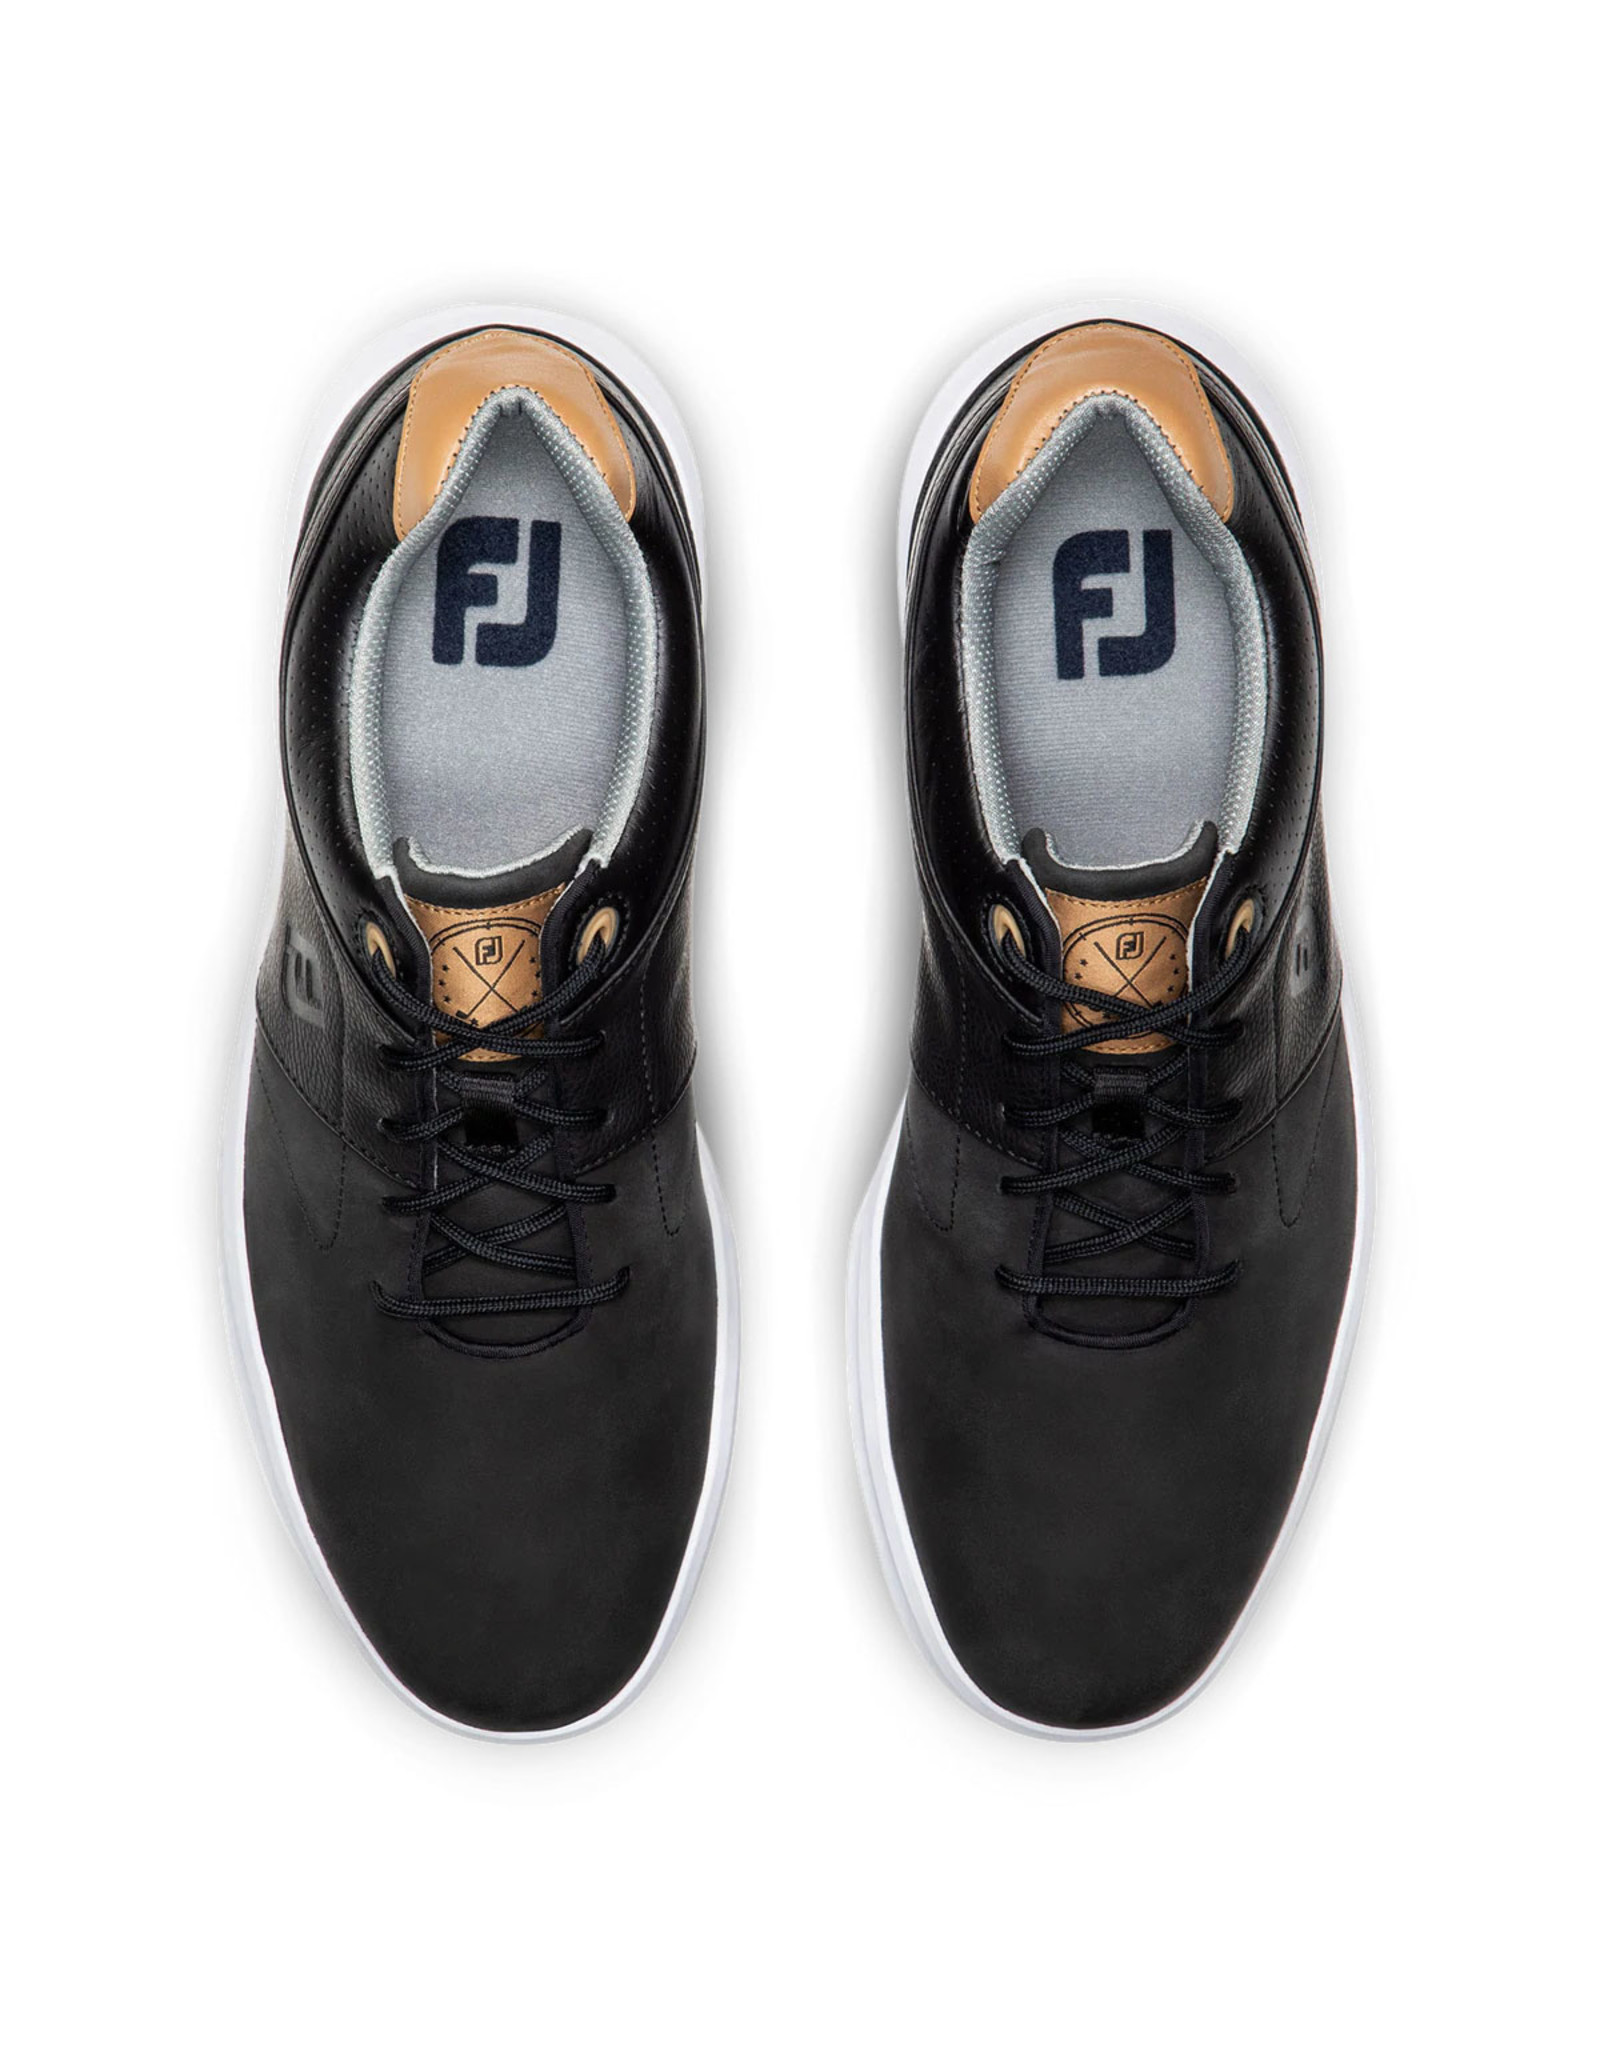 FootJoy FootJoy Contour Series All Black